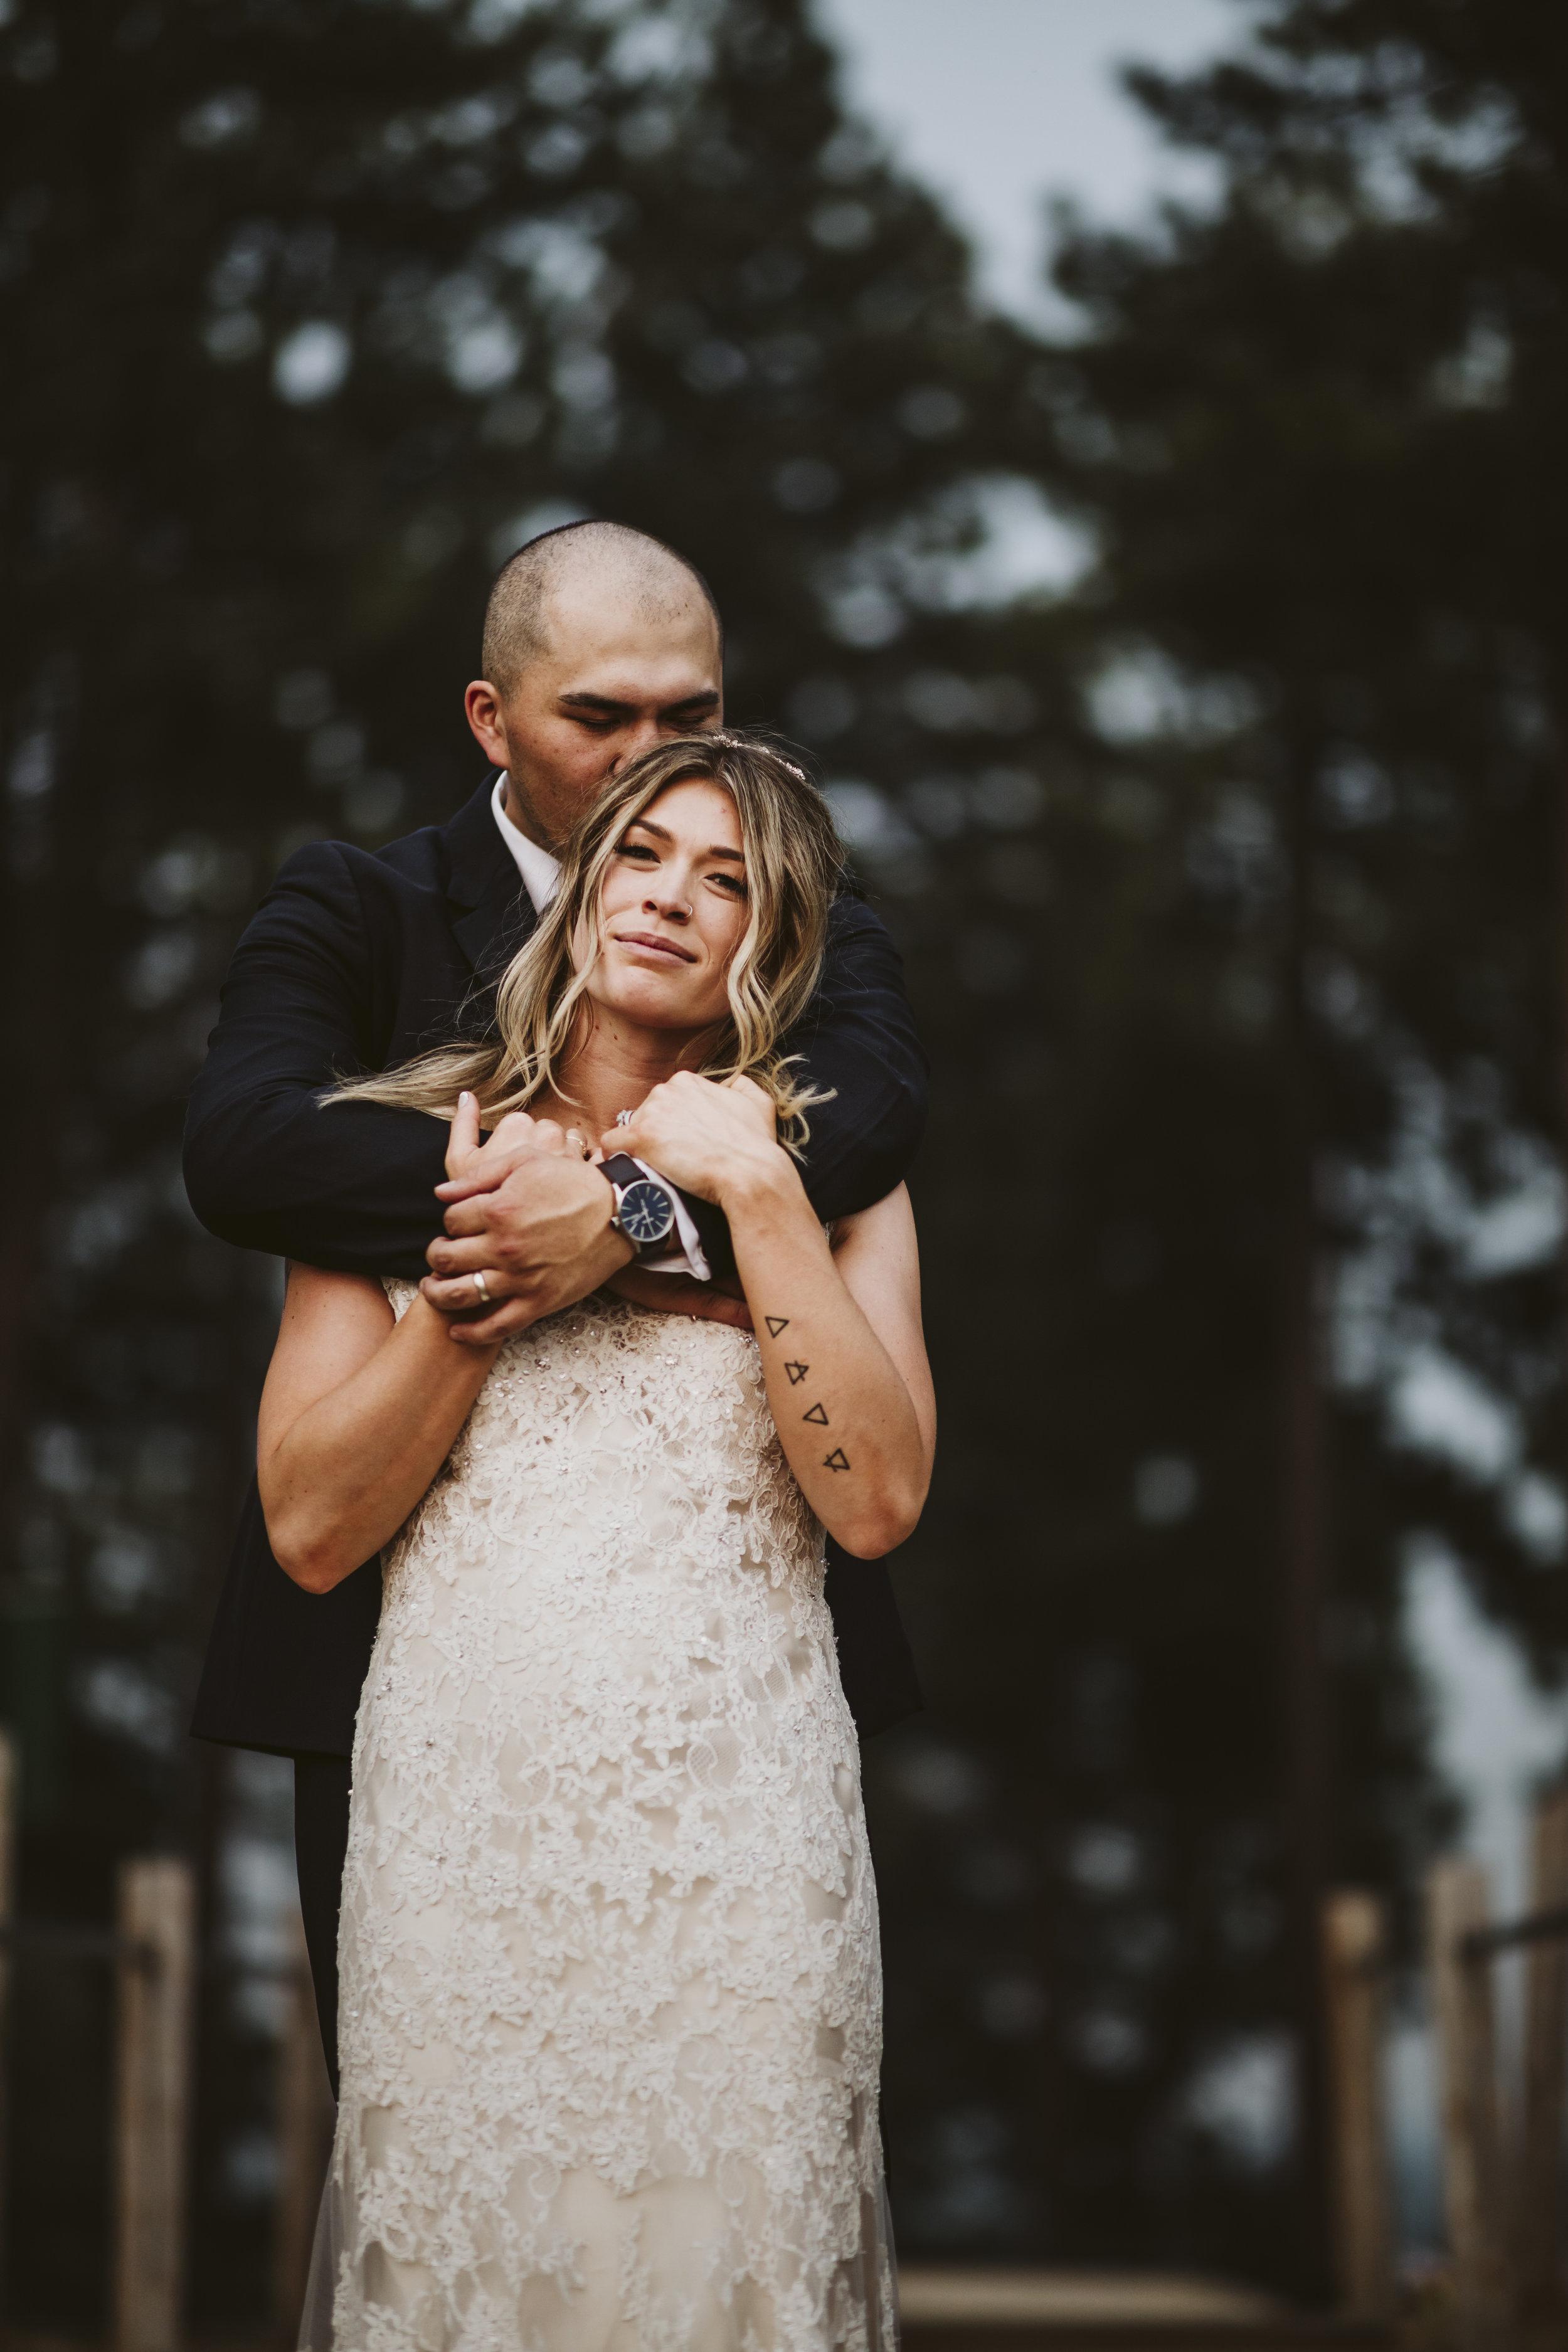 _P8A5588vild-vild photography-photography-wedding-wedding photography-tahoe-lake tahoe-lake tahoe wedding photographer-nevada wedding photographer-mountain wedding.jpg